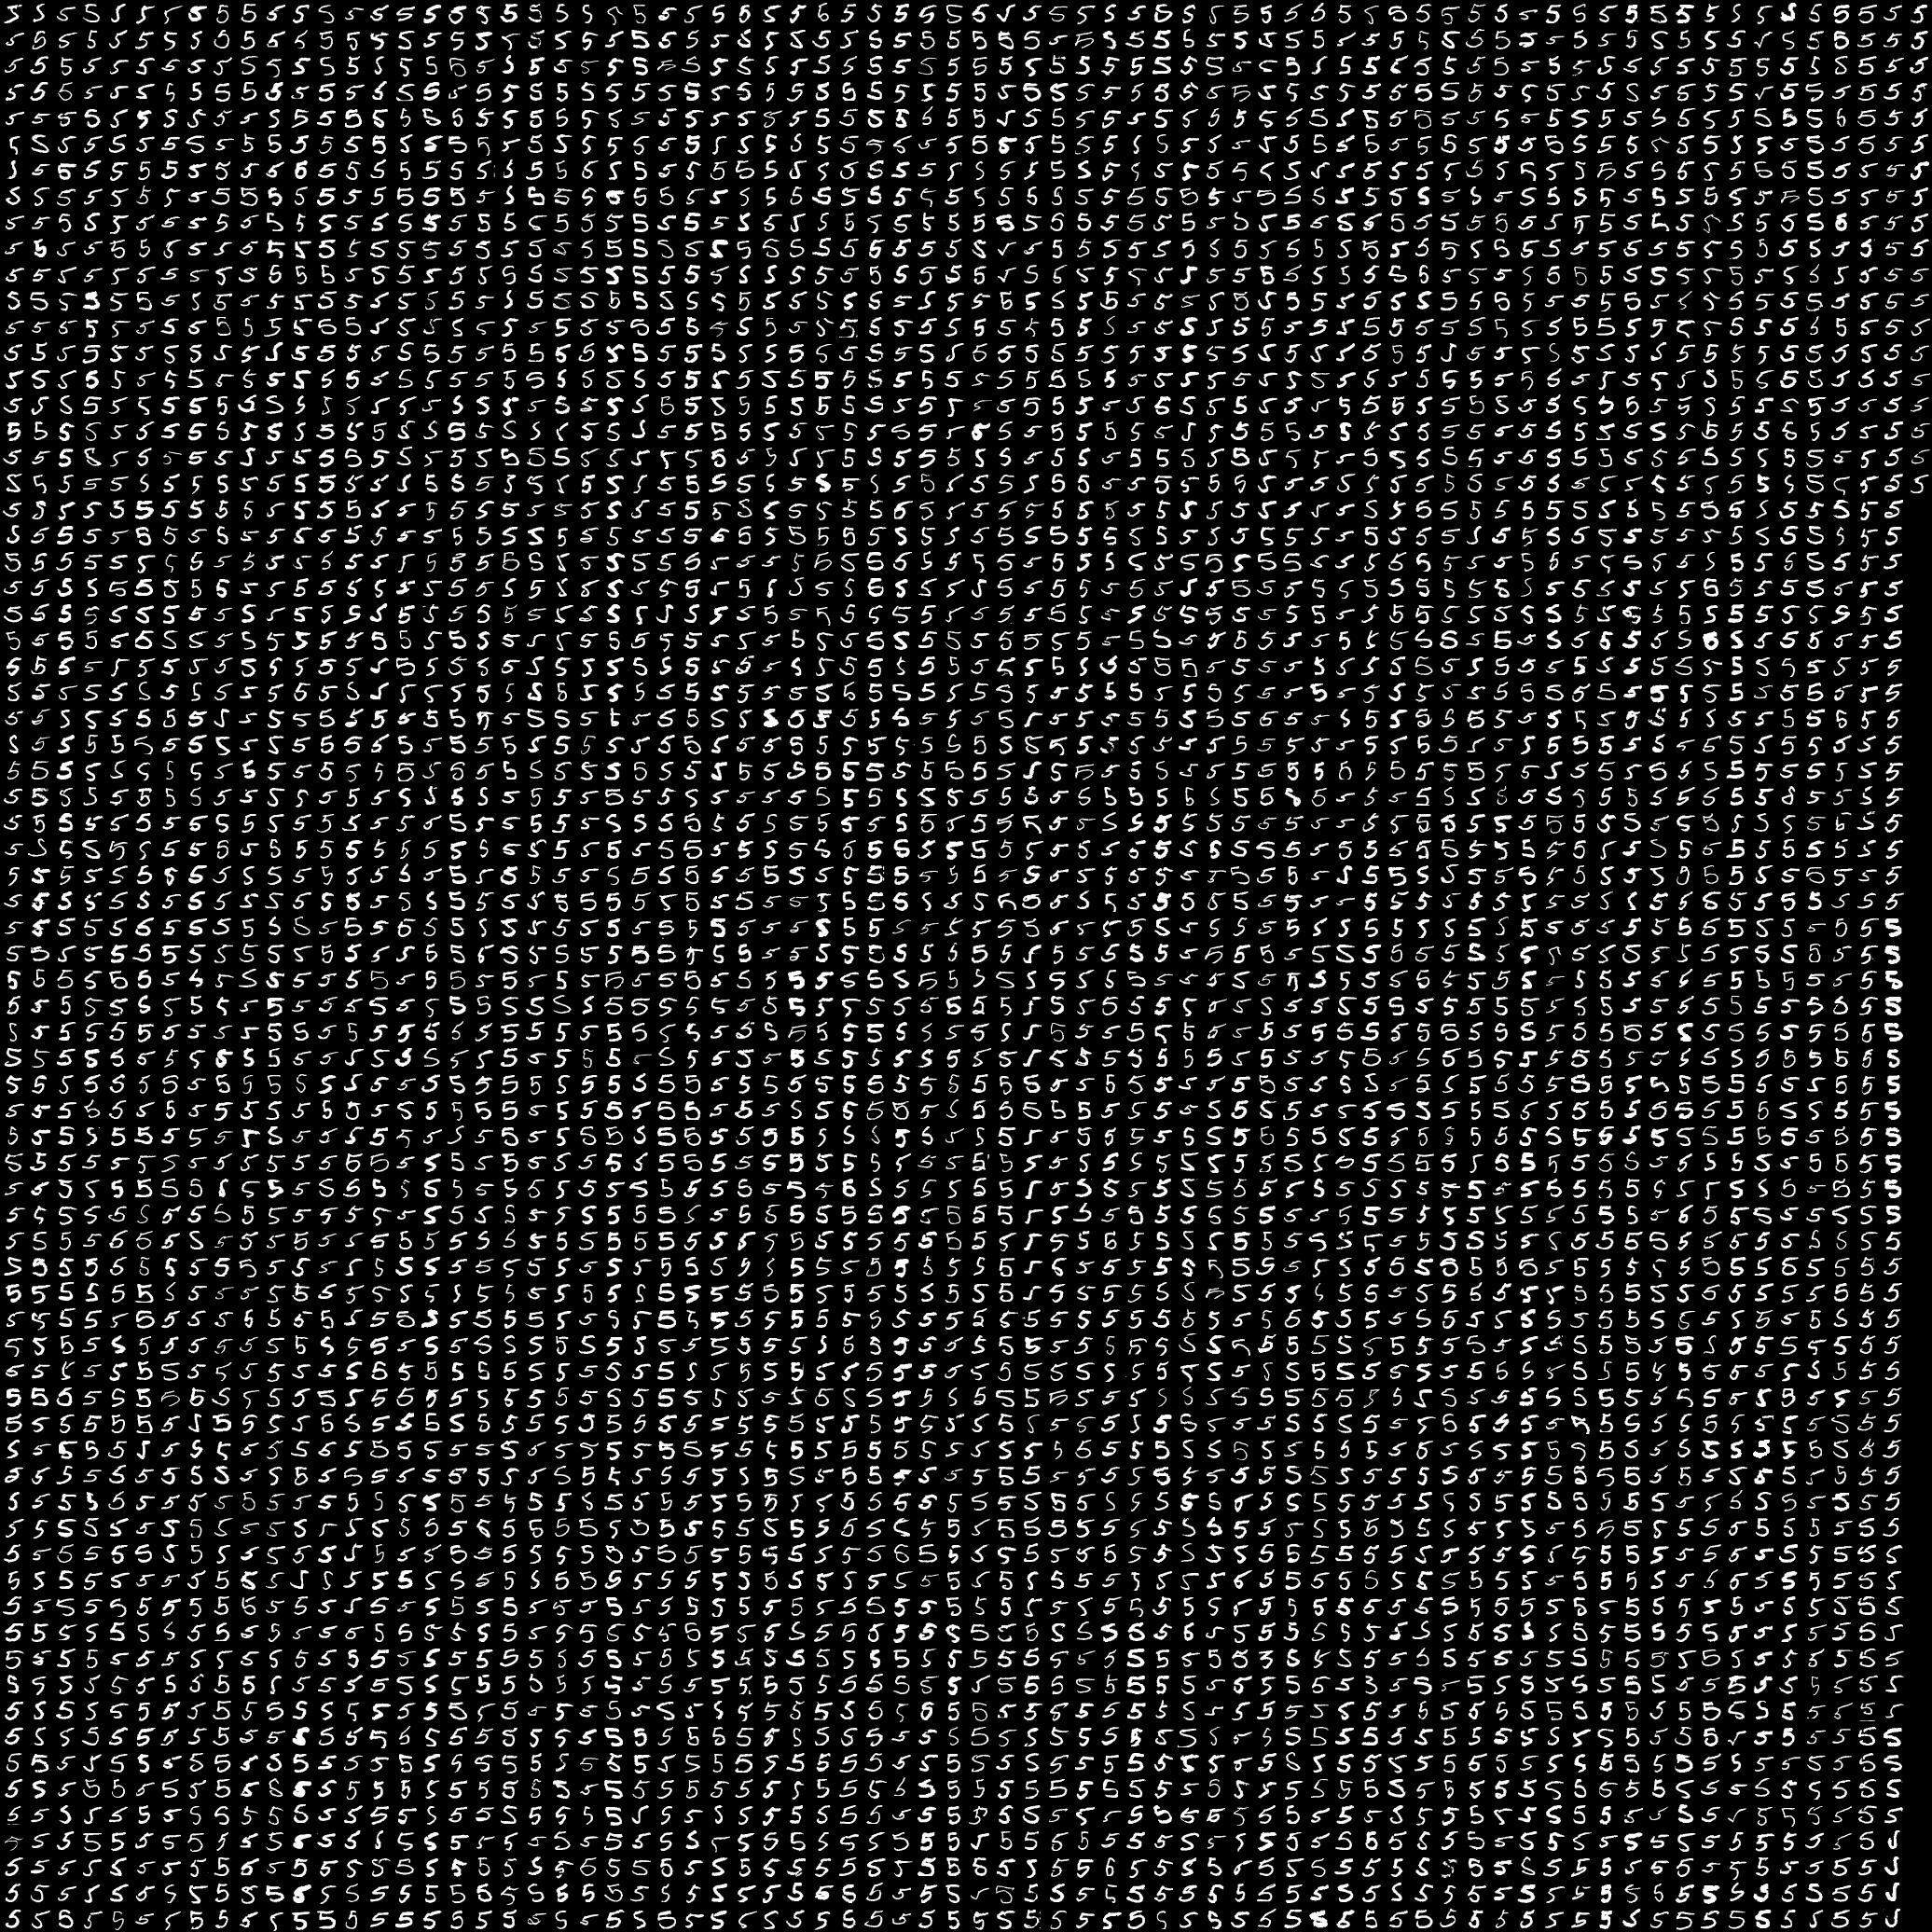 8 Bit Background Free Vector Art  116823 Free Downloads